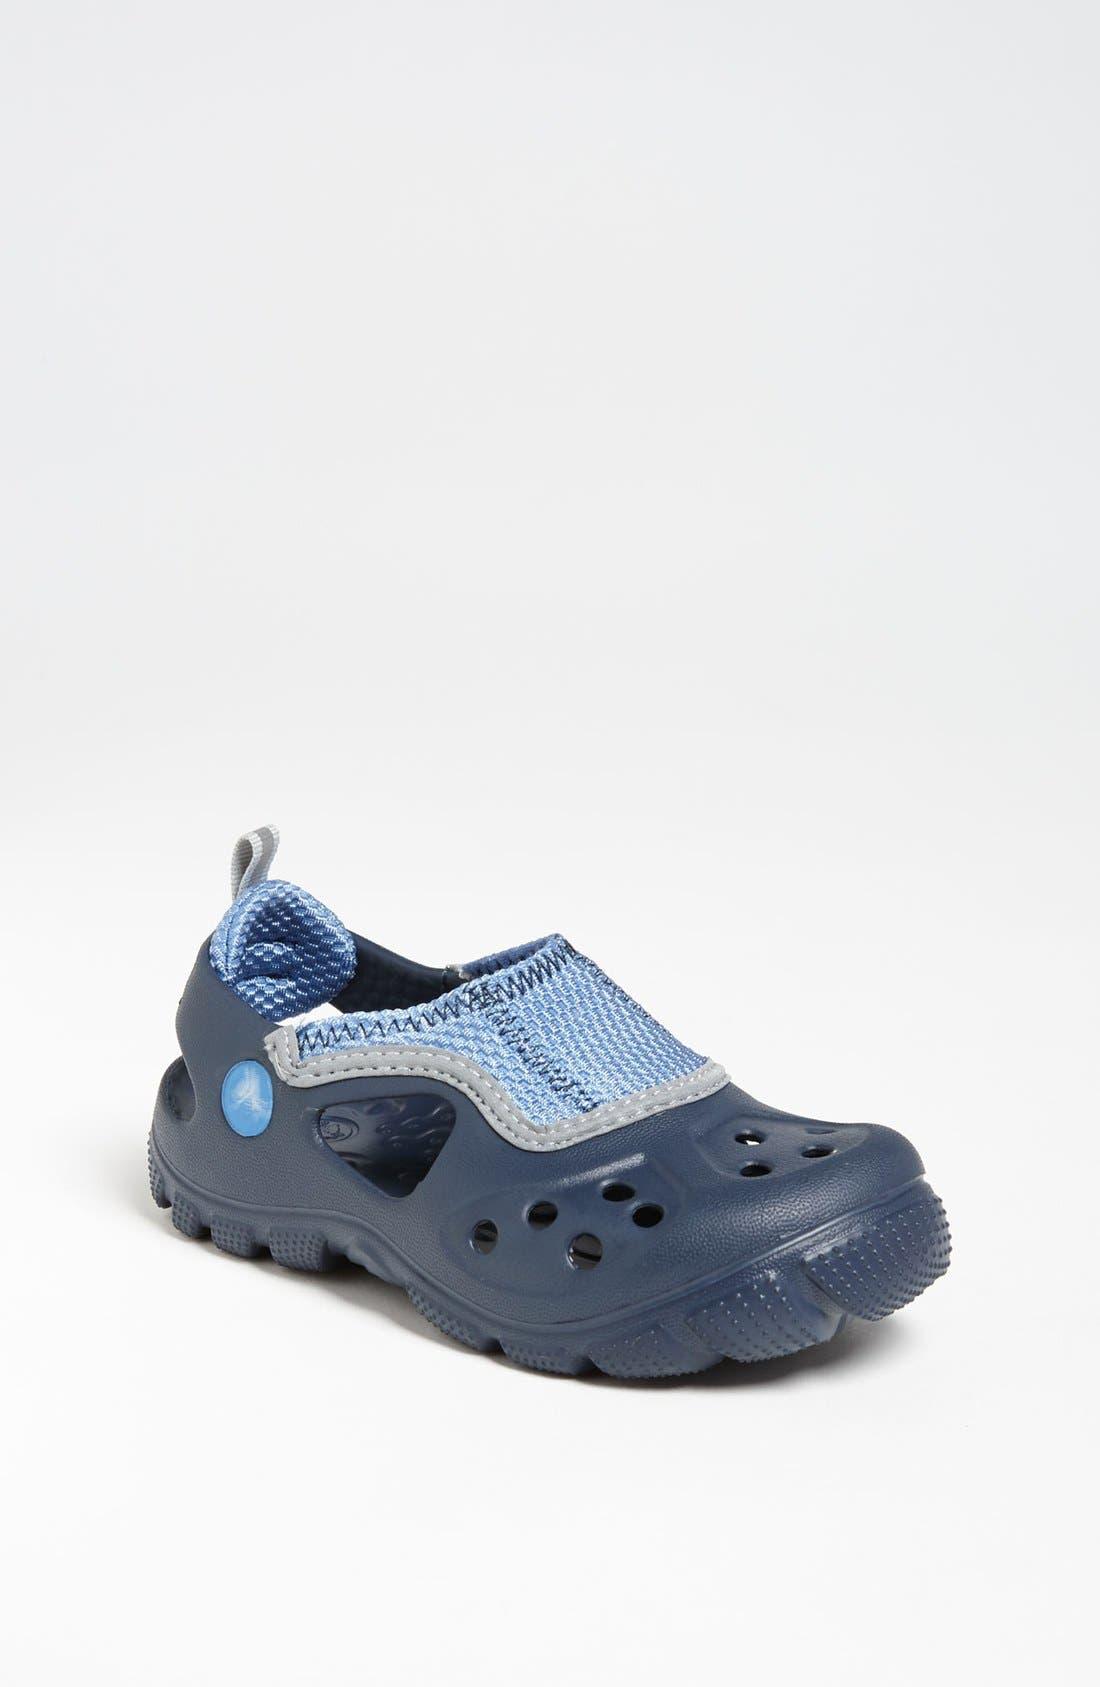 Alternate Image 1 Selected - CROCS™ 'Micah II' Sandal (Walker & Toddler)